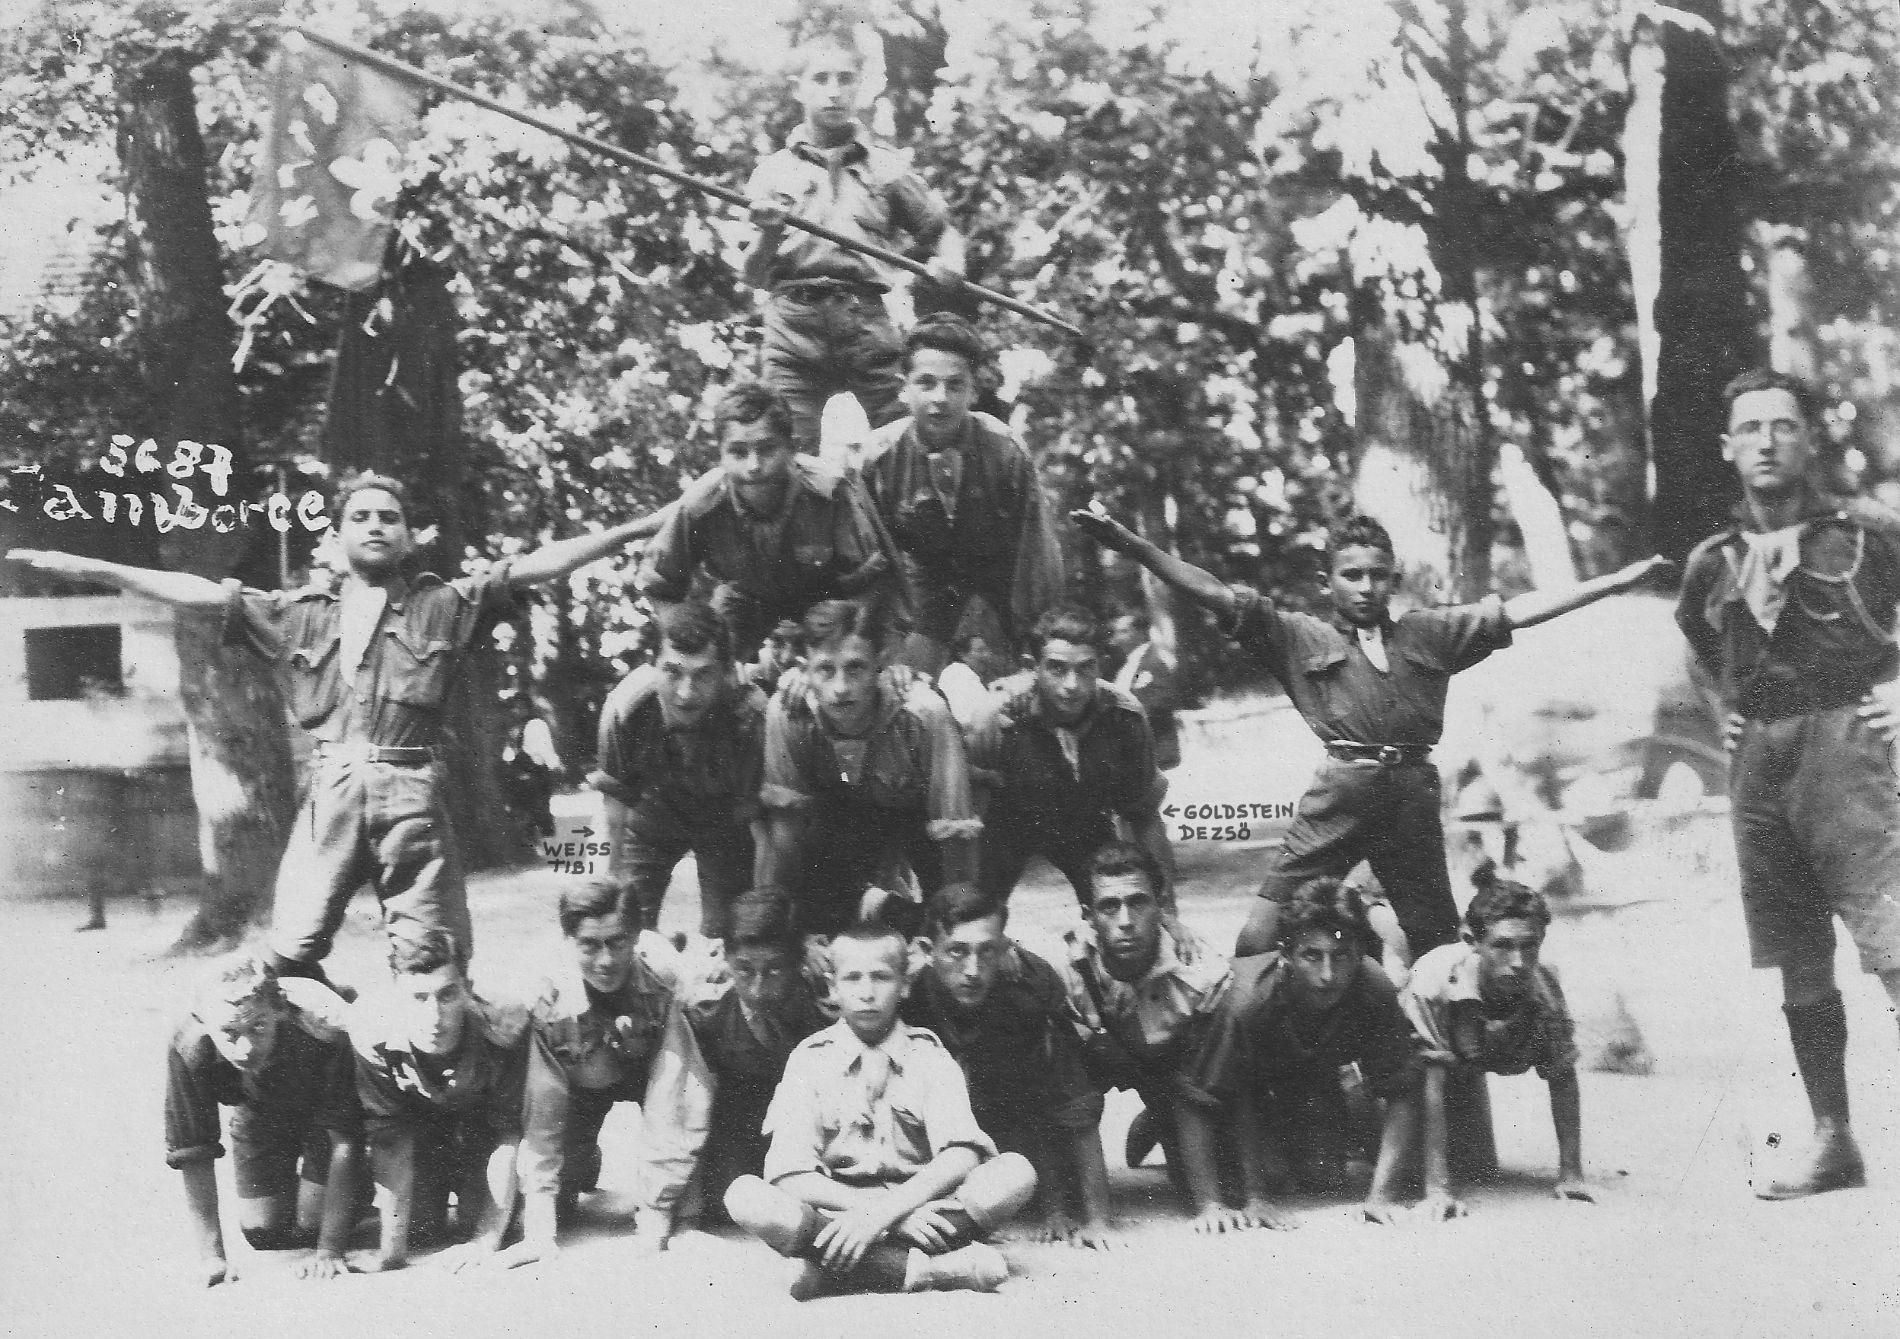 Kadiş tardiv în memoria cercetaşilor martiri timişoreni. De Tibor Weiss